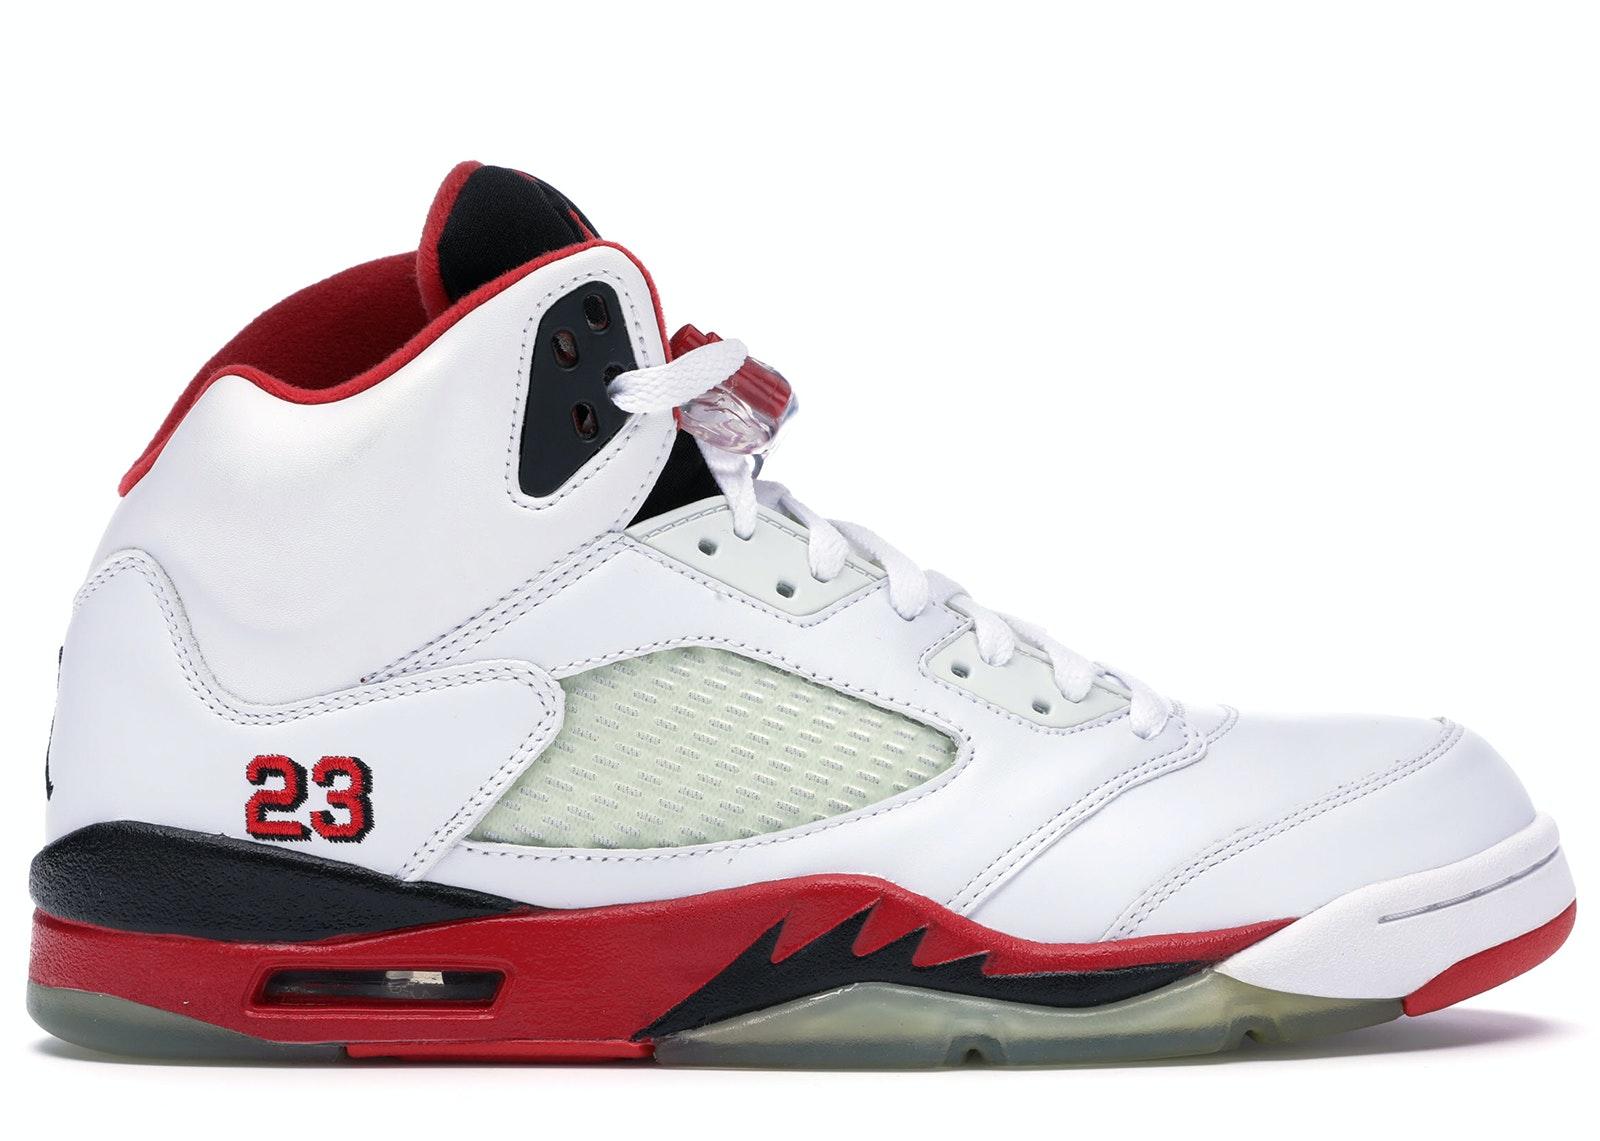 Jordan 5 Retro Fire Red (2006)